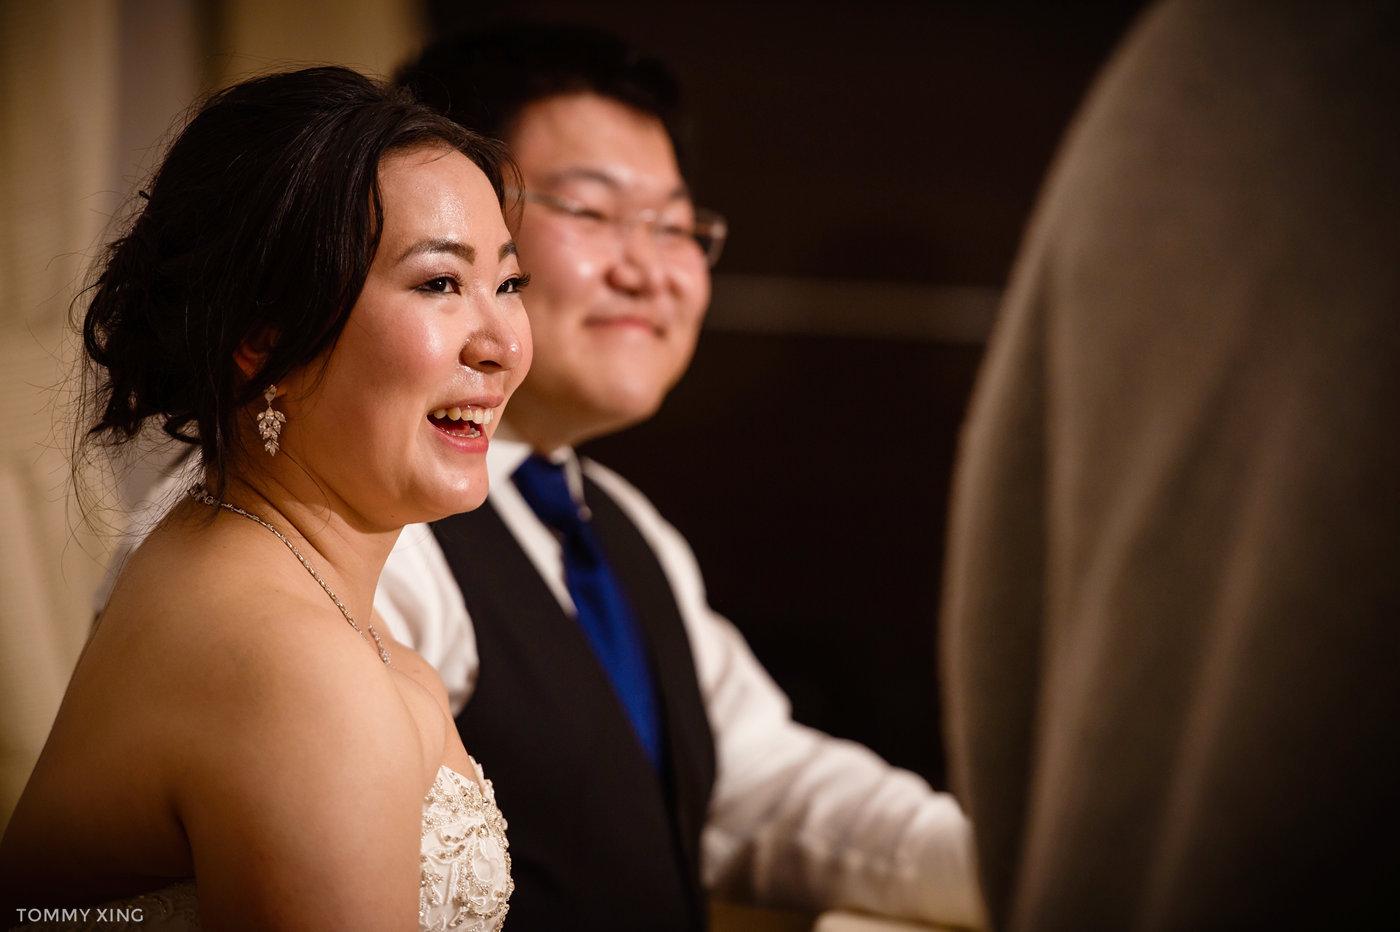 STANFORD MEMORIAL CHURCH WEDDING - Wenjie & Chengcheng - SAN FRANCISCO BAY AREA 斯坦福教堂婚礼跟拍 - 洛杉矶婚礼婚纱照摄影师 Tommy Xing Photography199.jpg